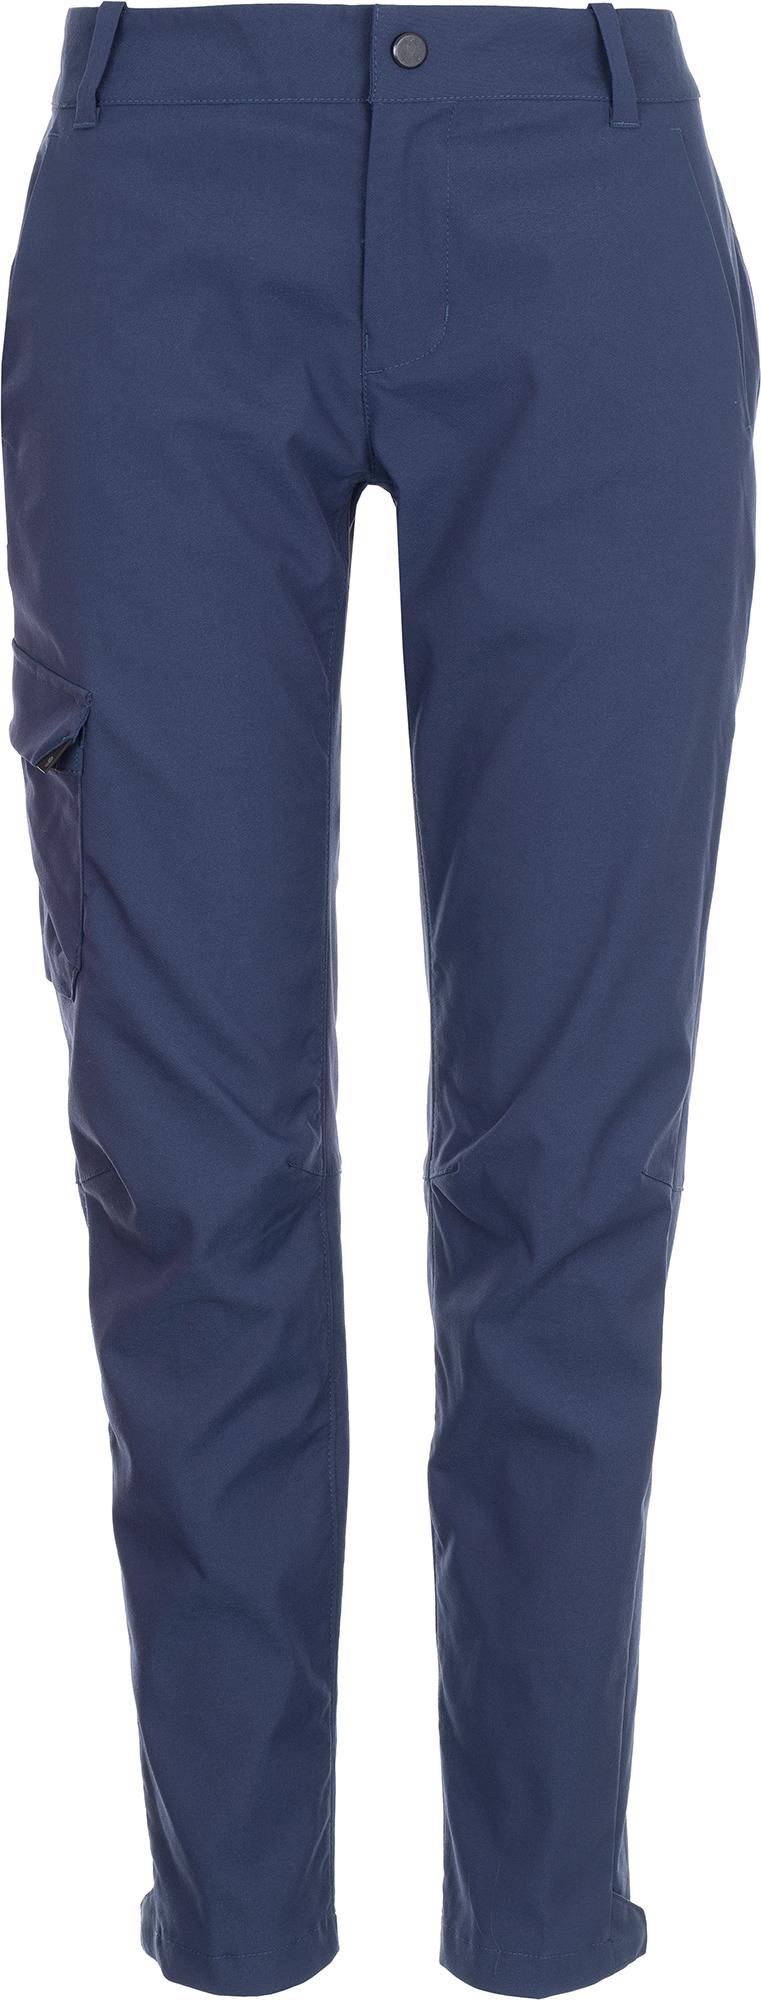 цена на Mountain Hardwear Брюки женские Mountain Hardwear Canyon Pro, размер 48